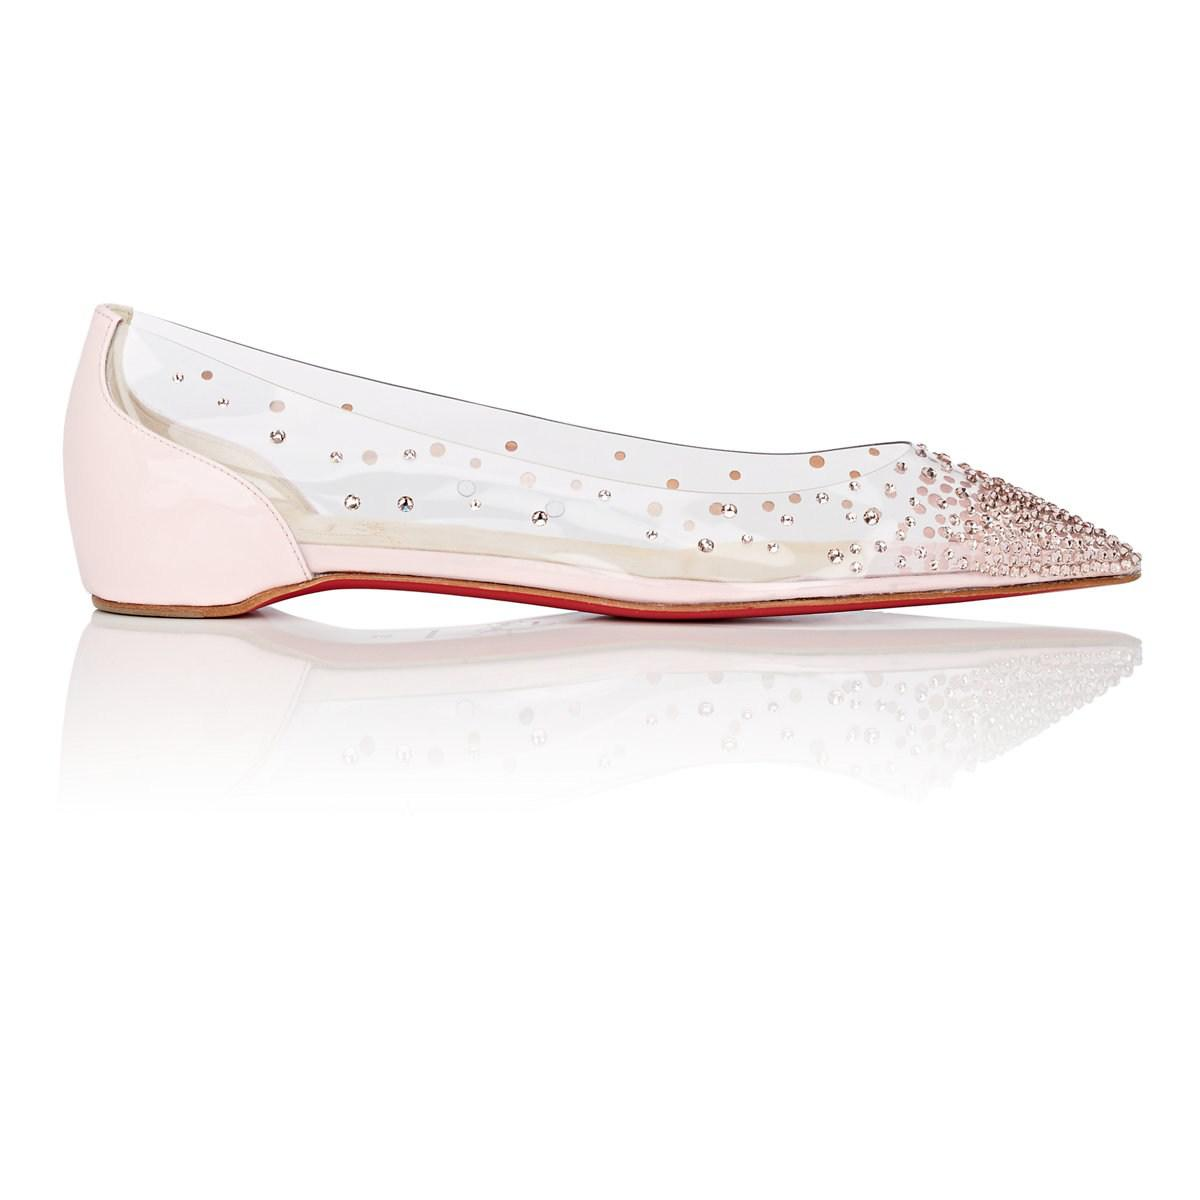 super popular b394d b9bc7 Women's Pink Degrastrass Pvc & Patent Leather Flats